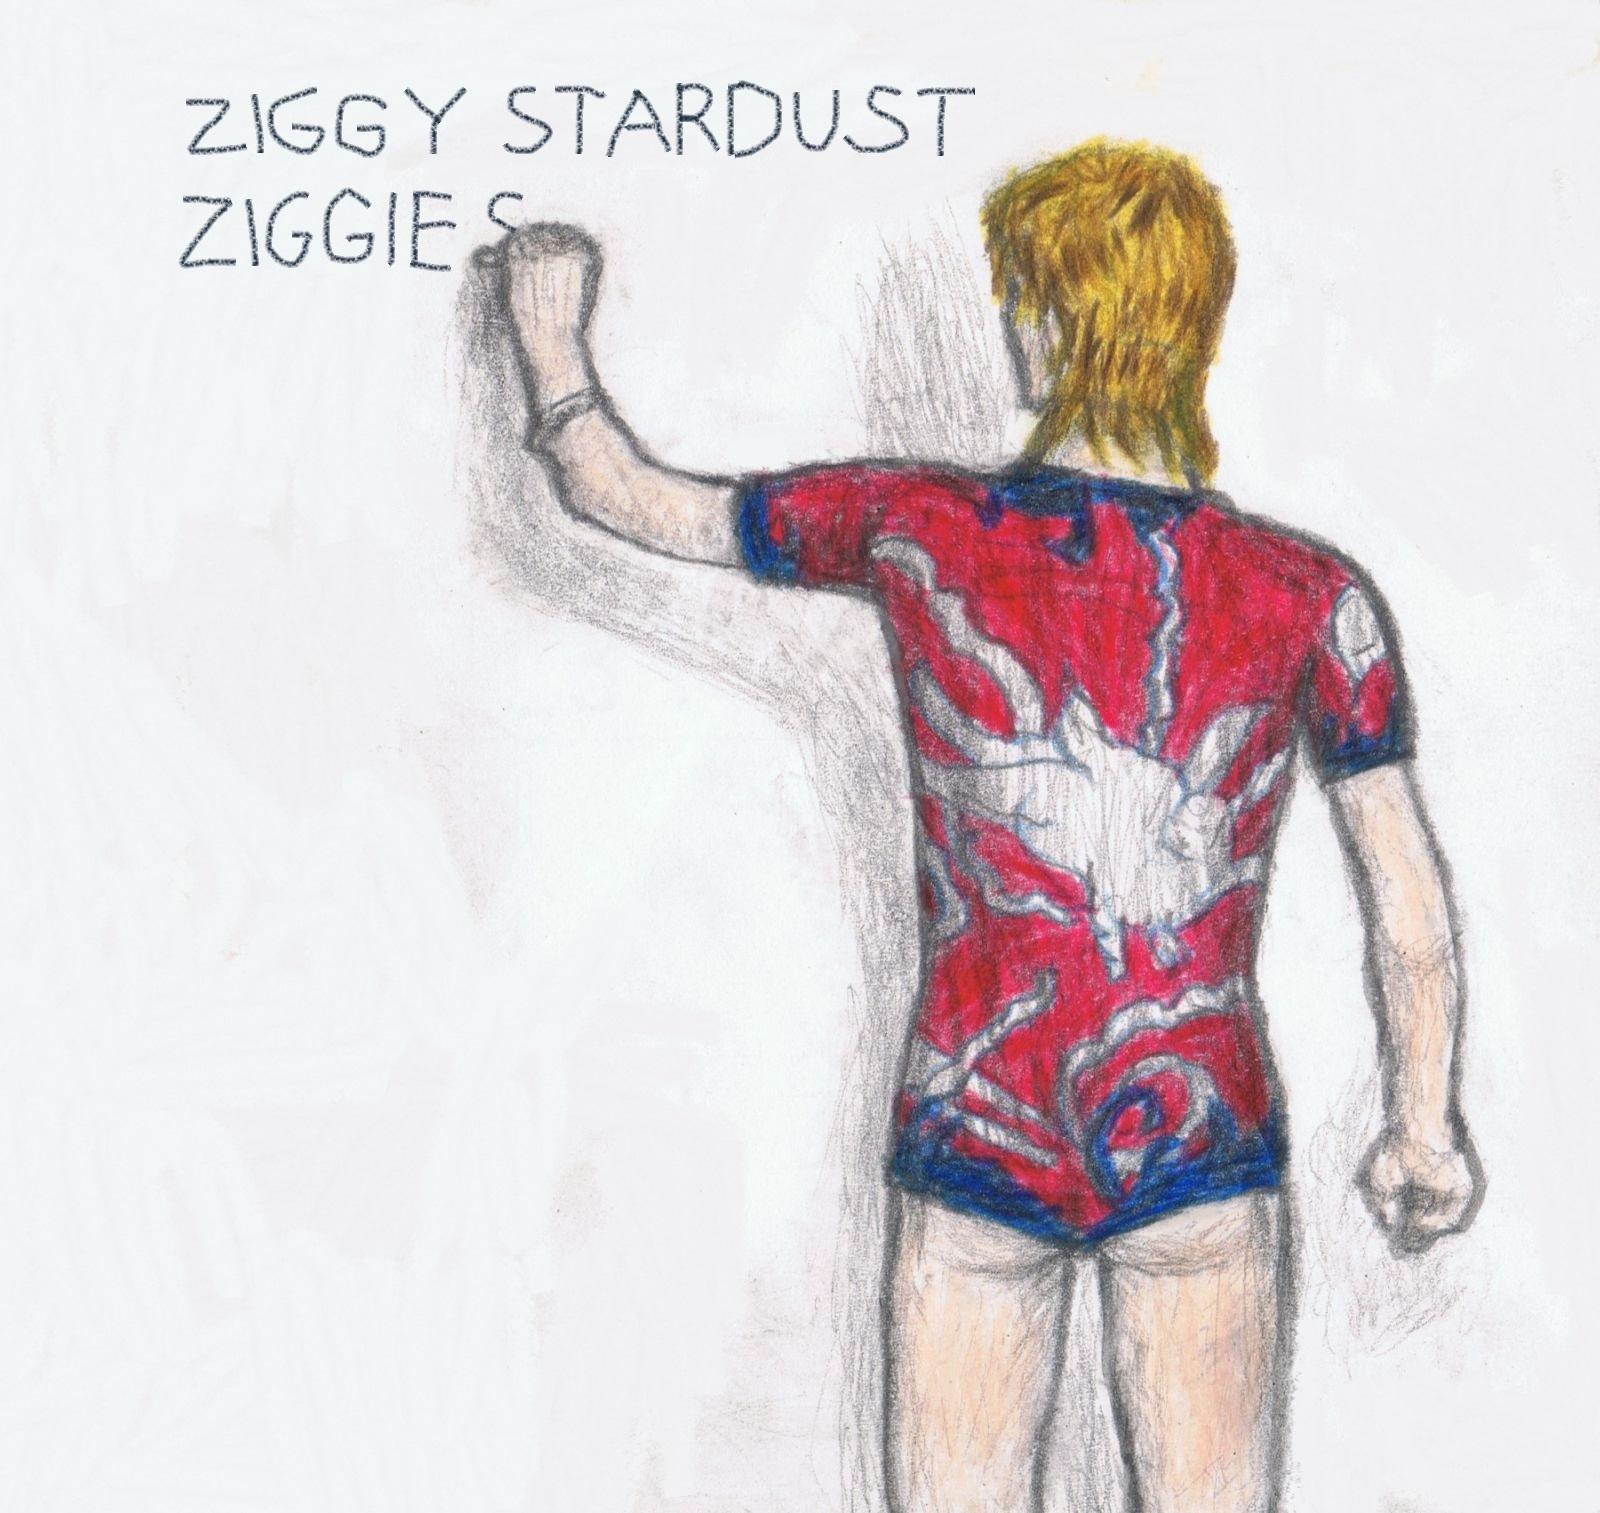 Ziggy 'Ziggie' Stardust by gagambo